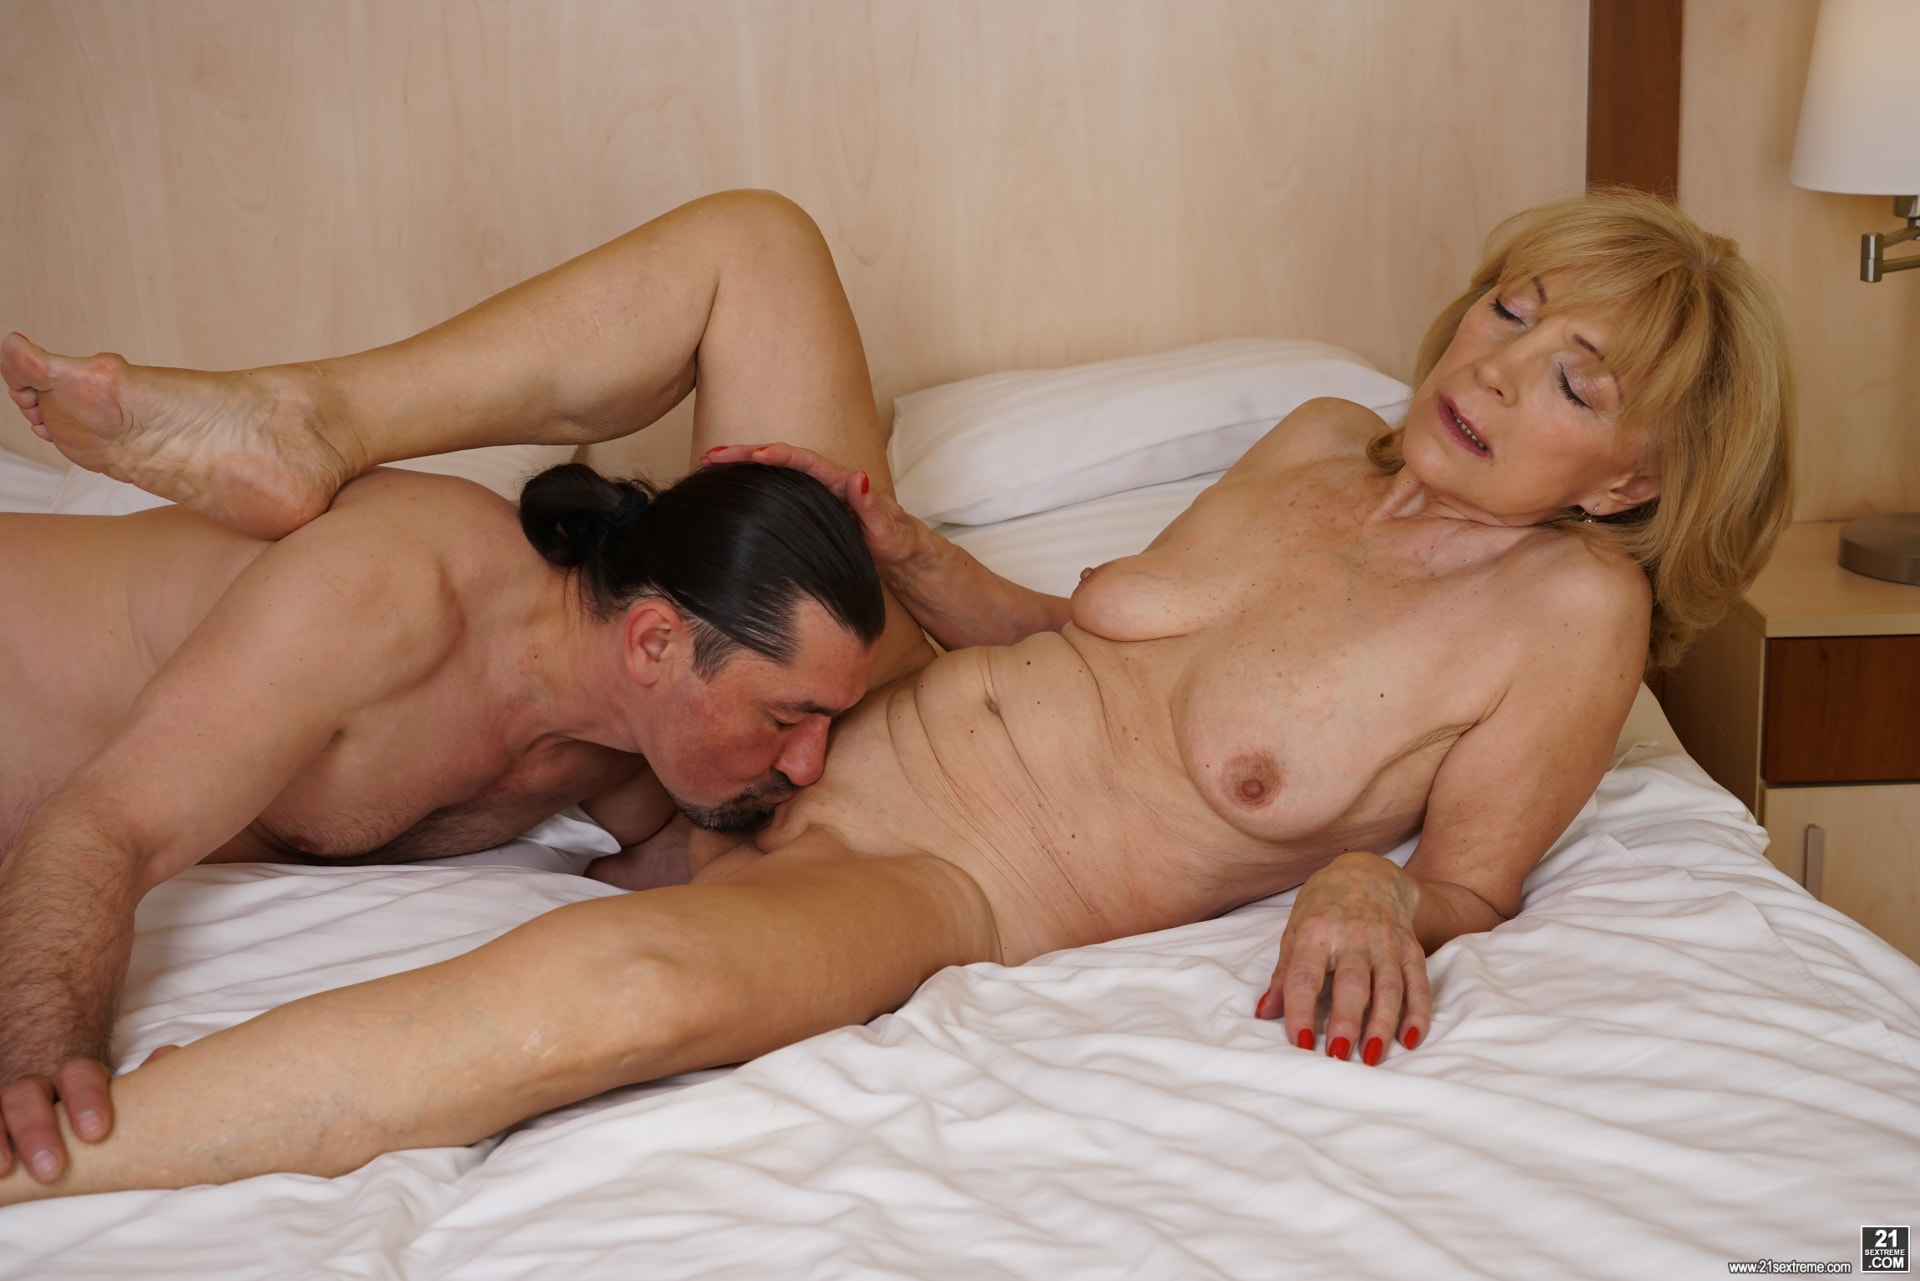 21Sextury 'Lusty Szuzanne's Naughty Fun' starring Szuzanne (Photo 48)